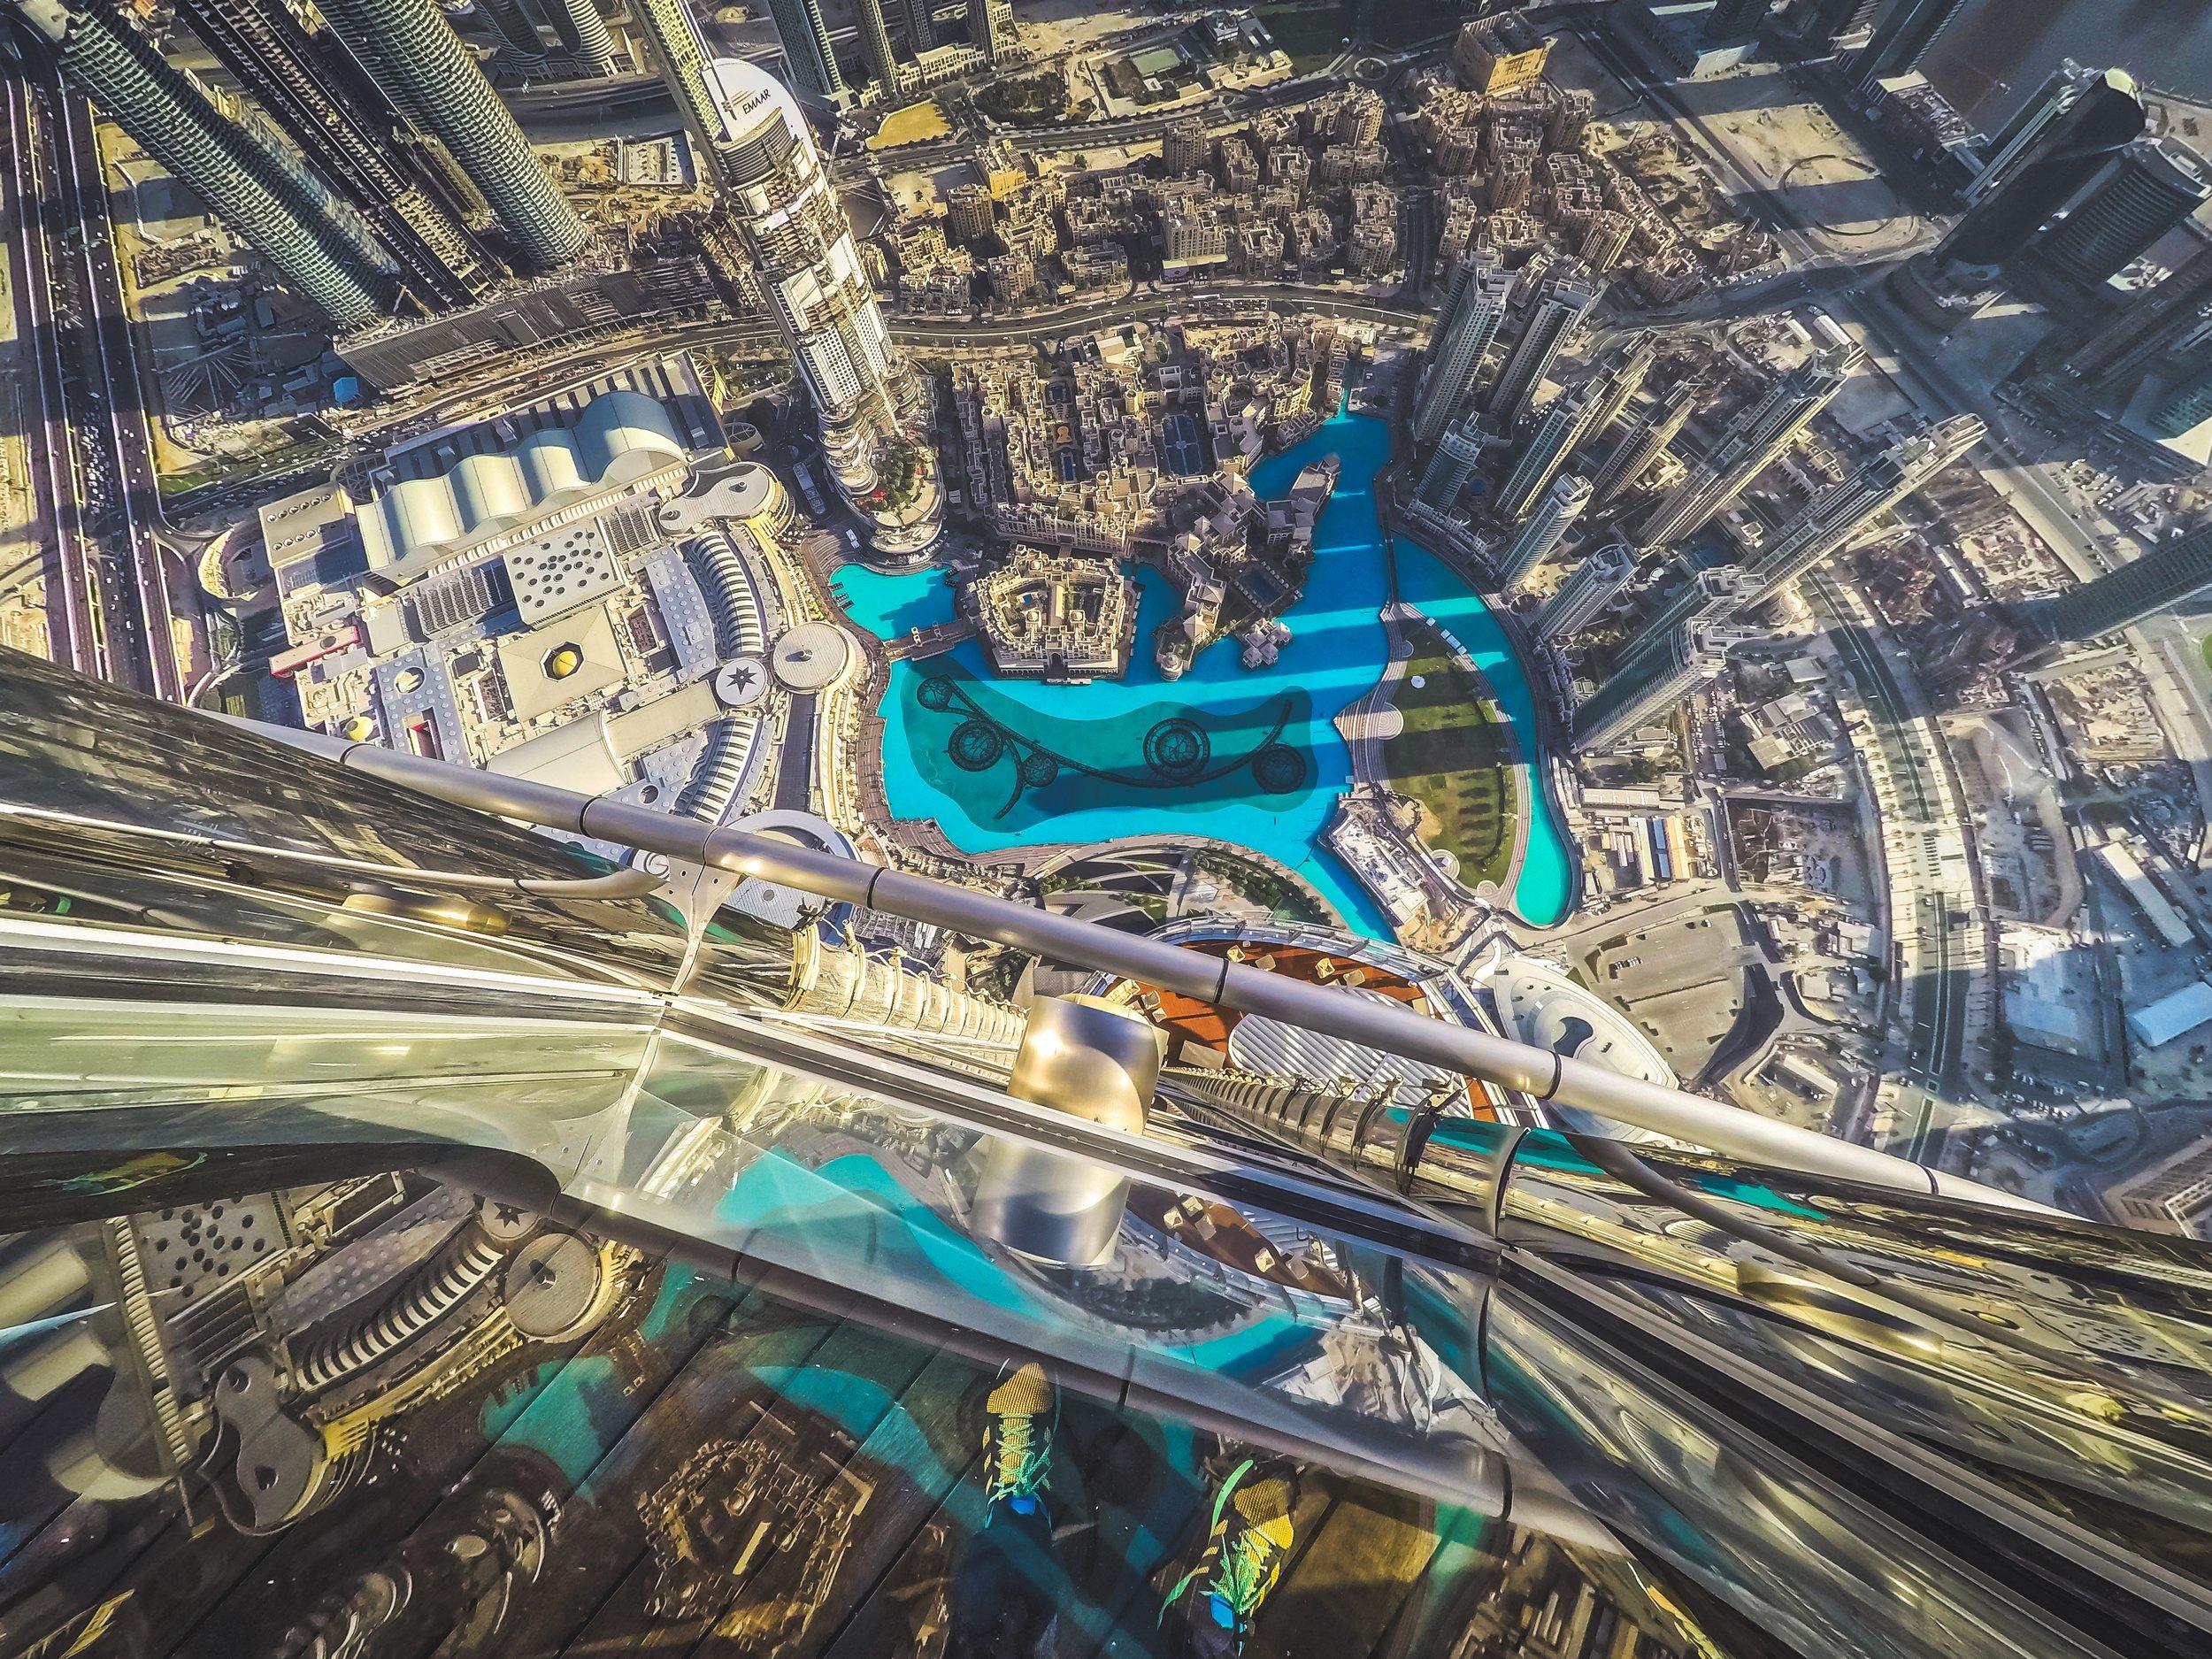 At the Top of the Burj Khalifa — Photo by ©  Frank Da Silva